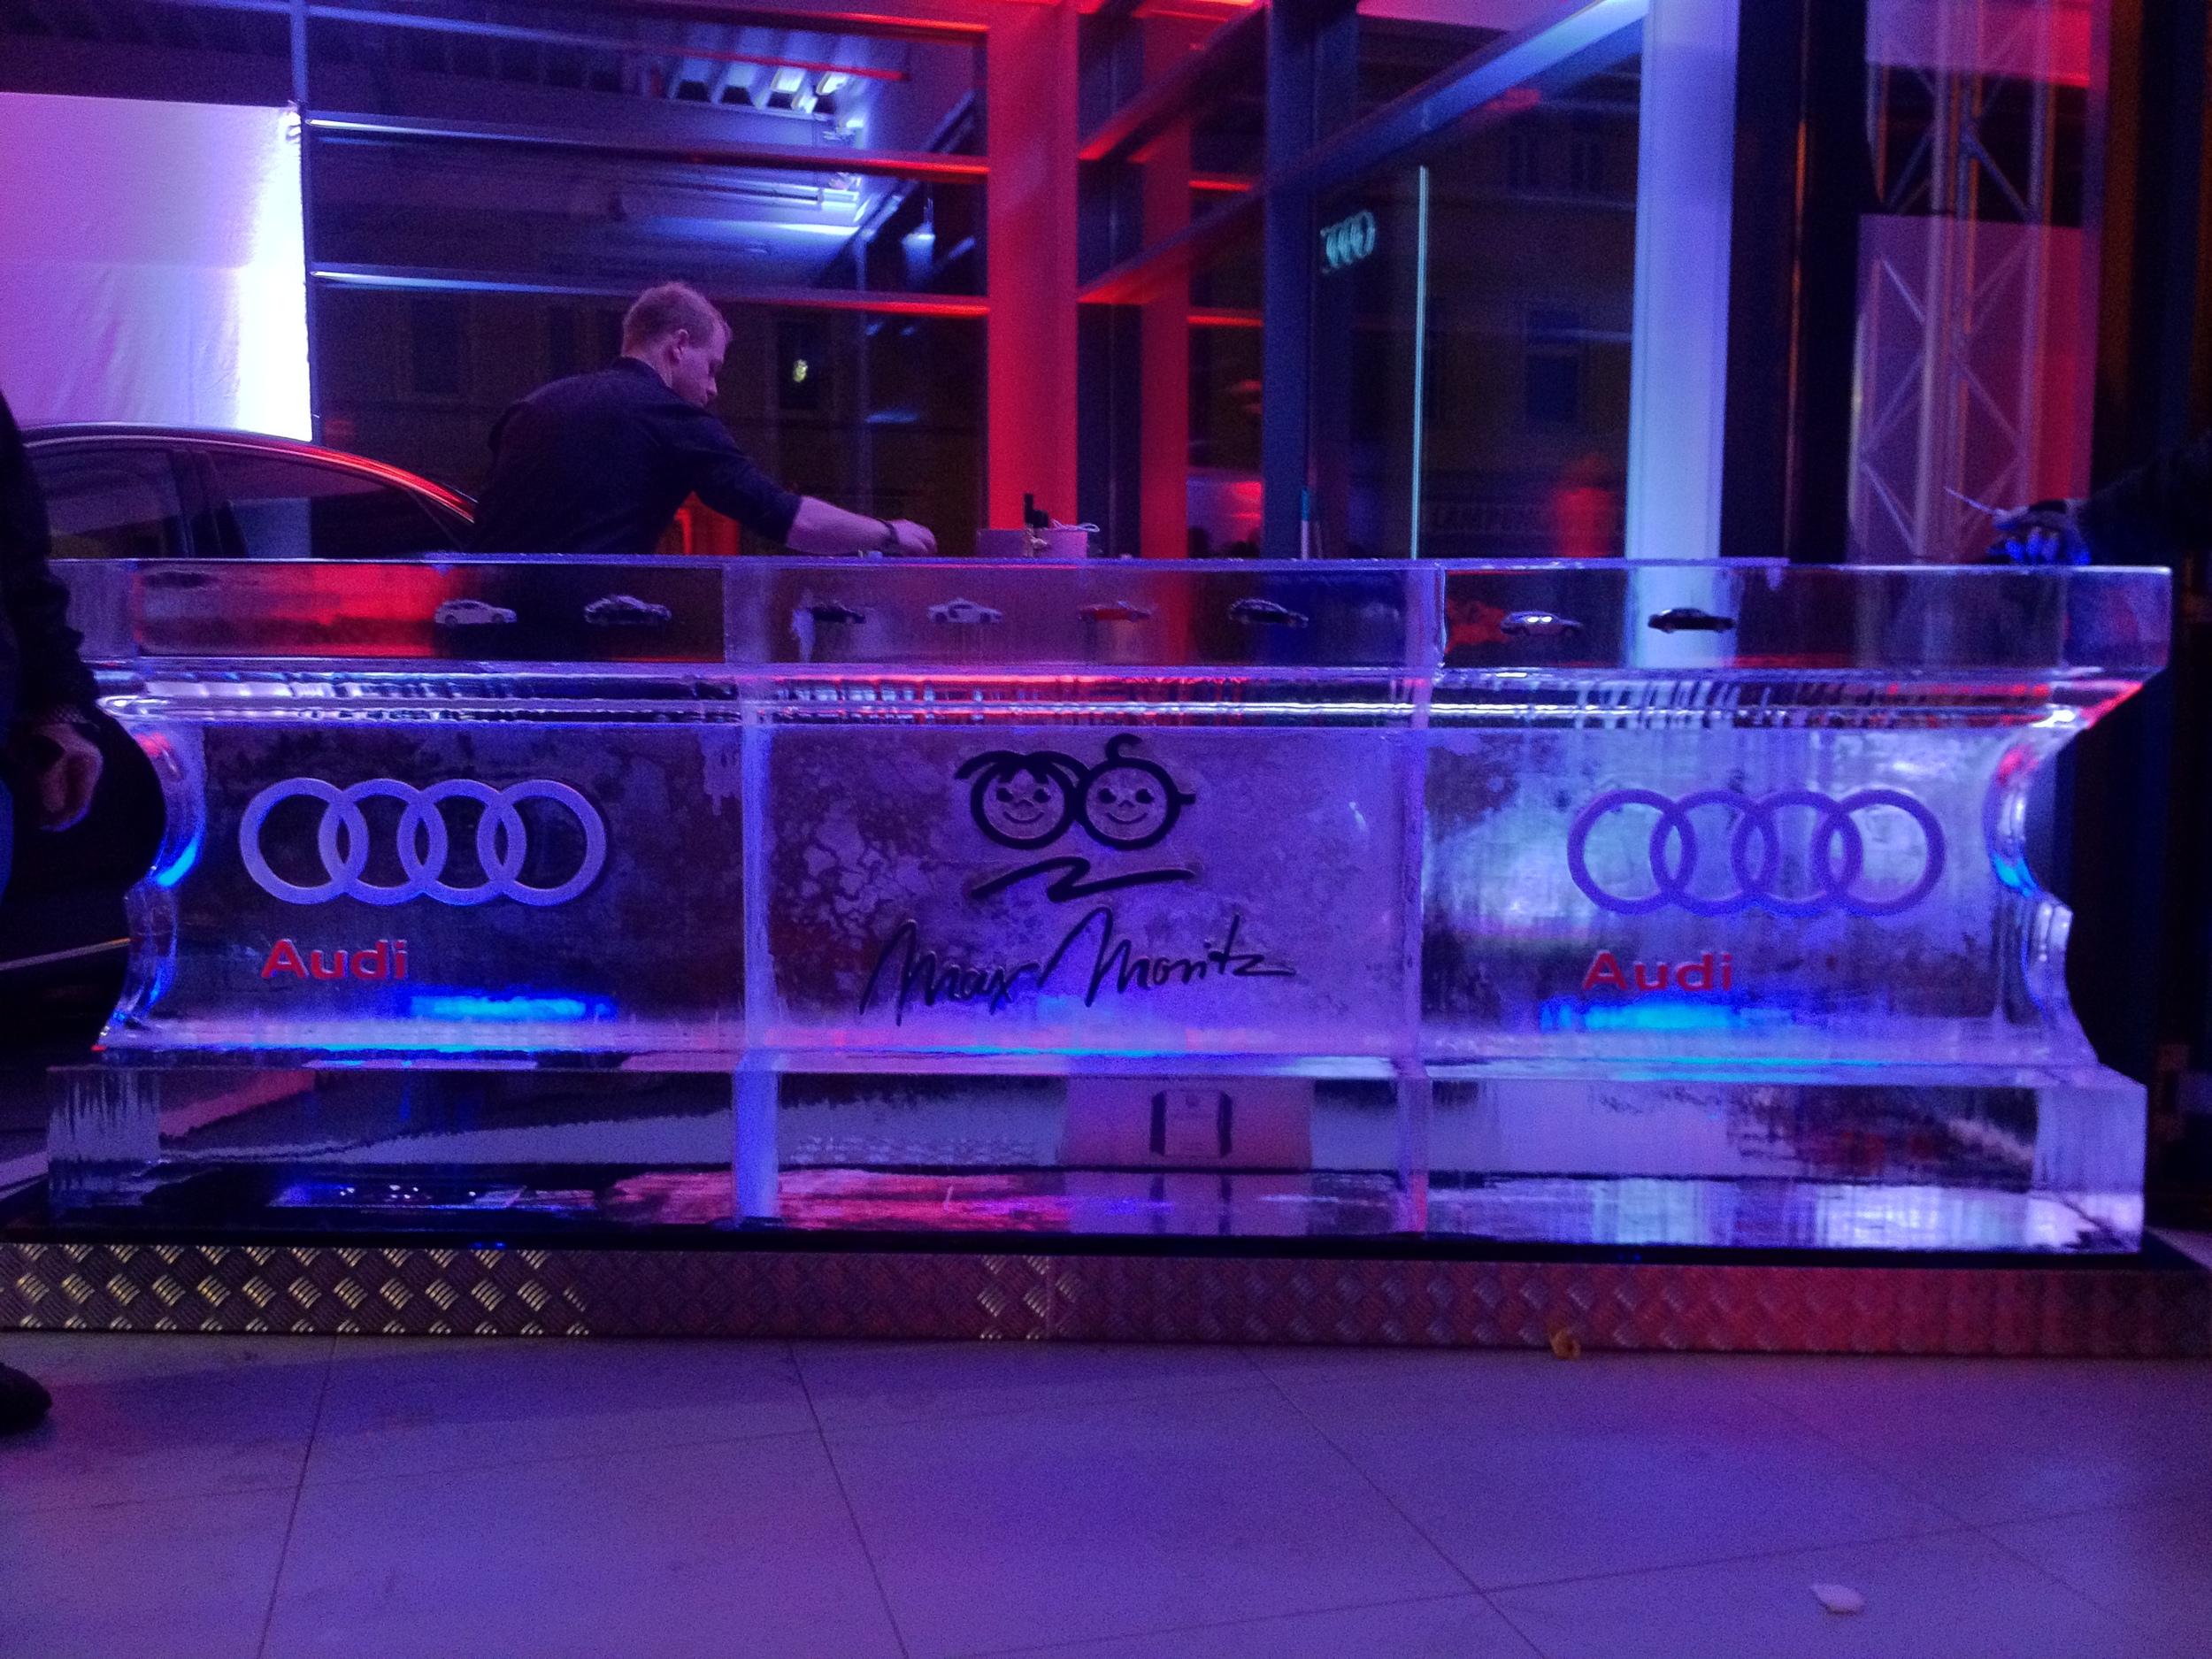 Audi Ice Bar